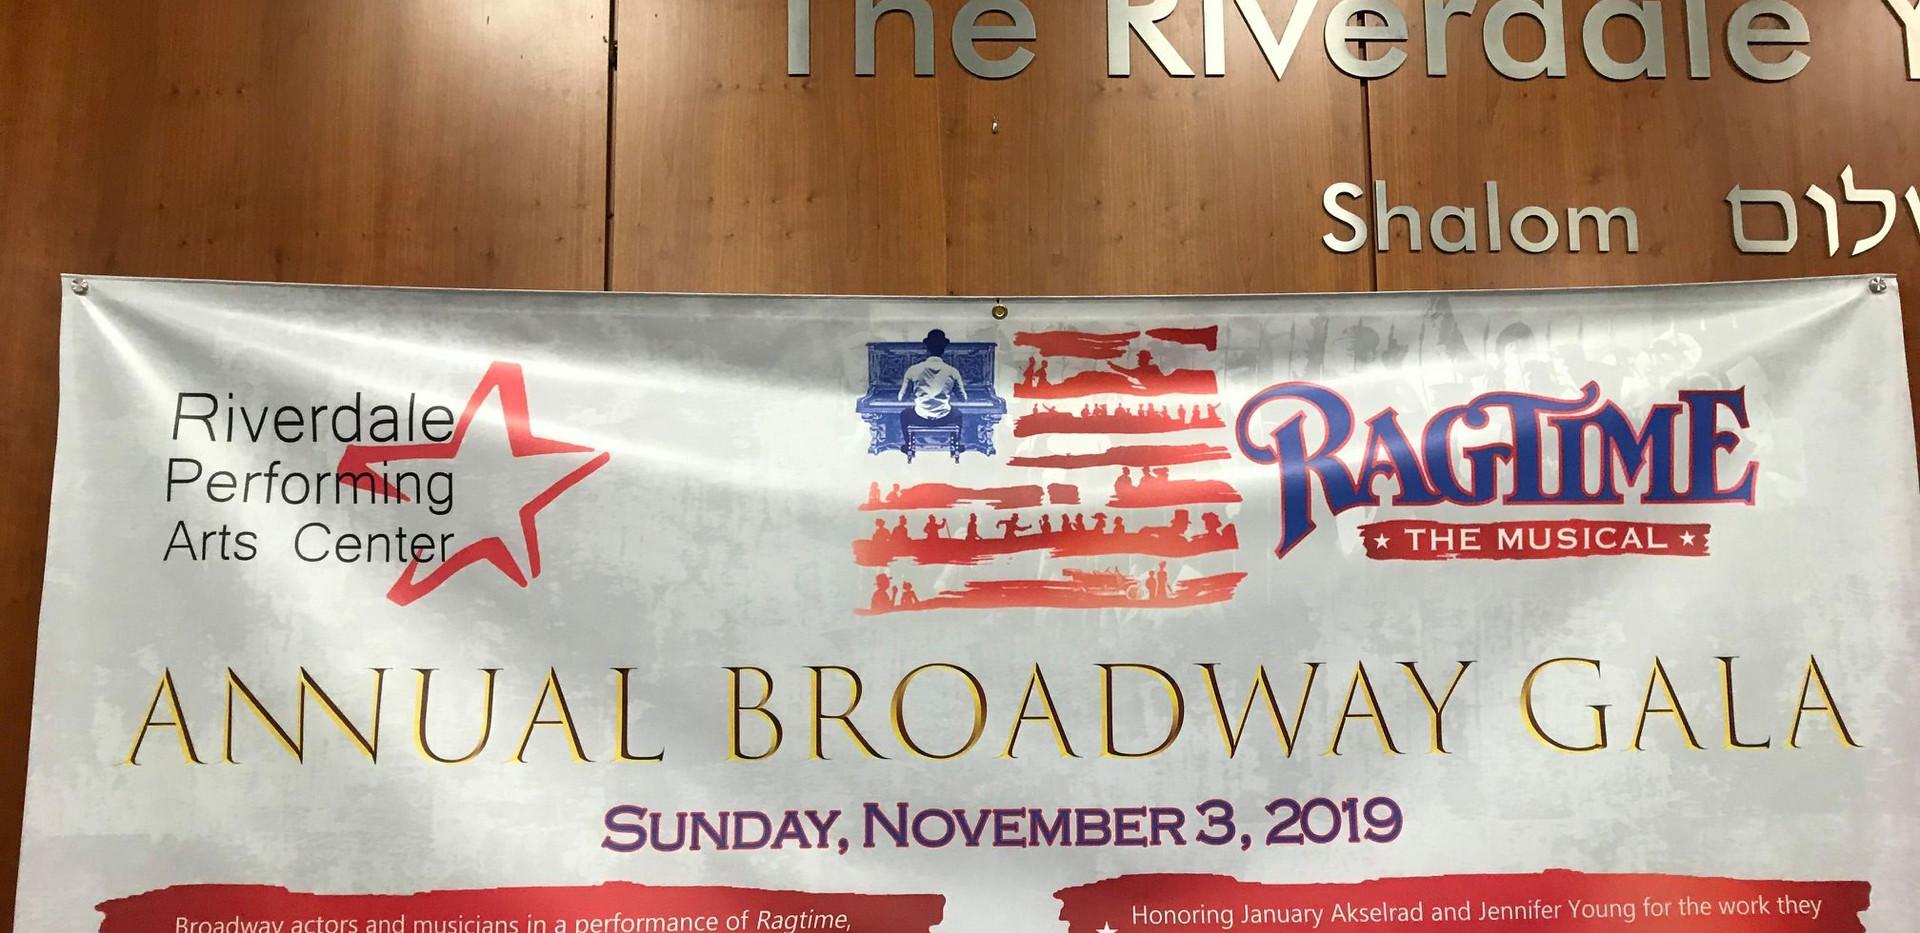 2019 RRS Annual Broadway Gala